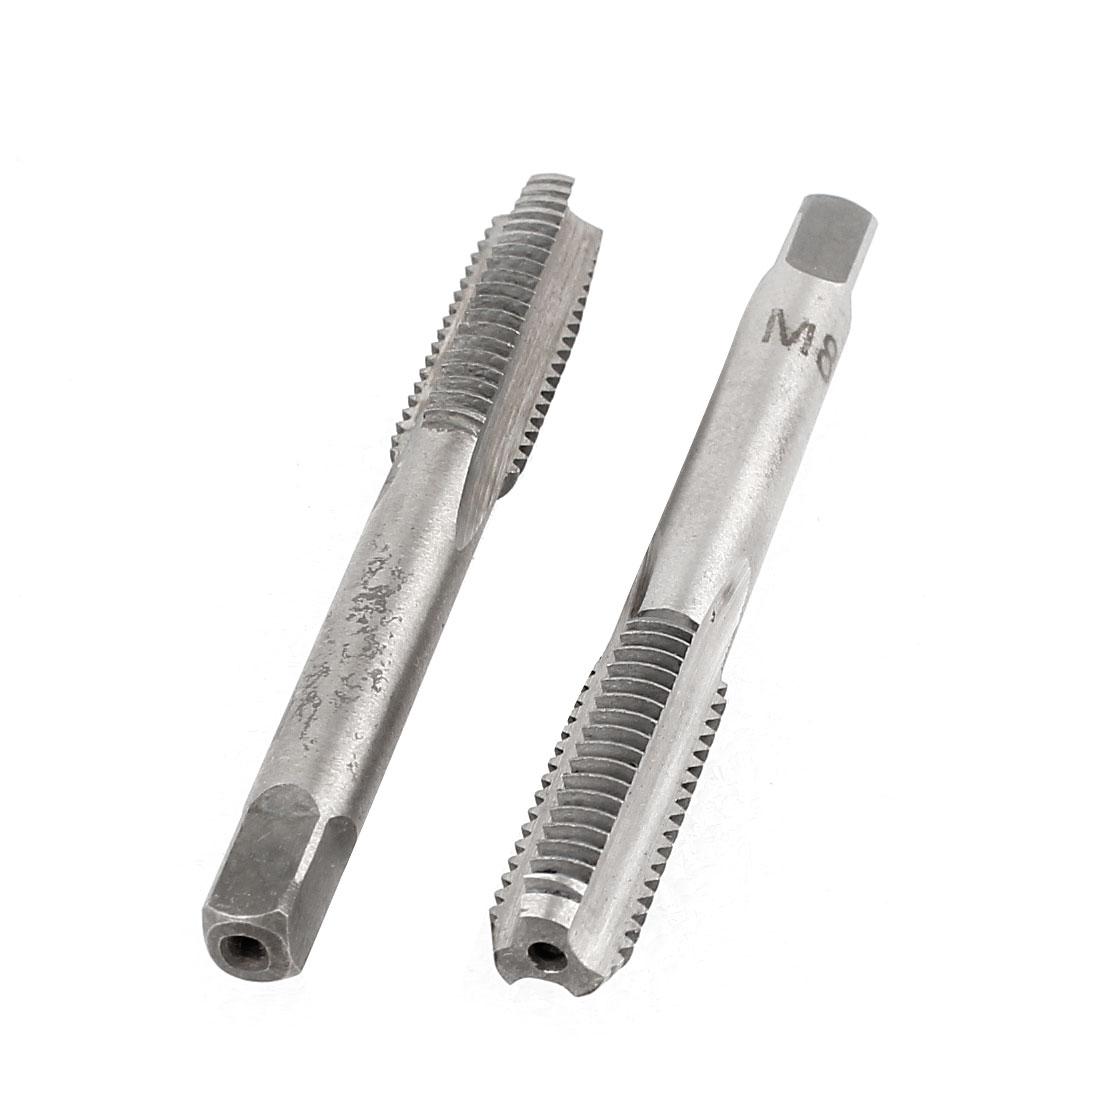 2 Pcs M8x23mm HSS 3 Flutes Hand Screw Thread Straight Metric Taps